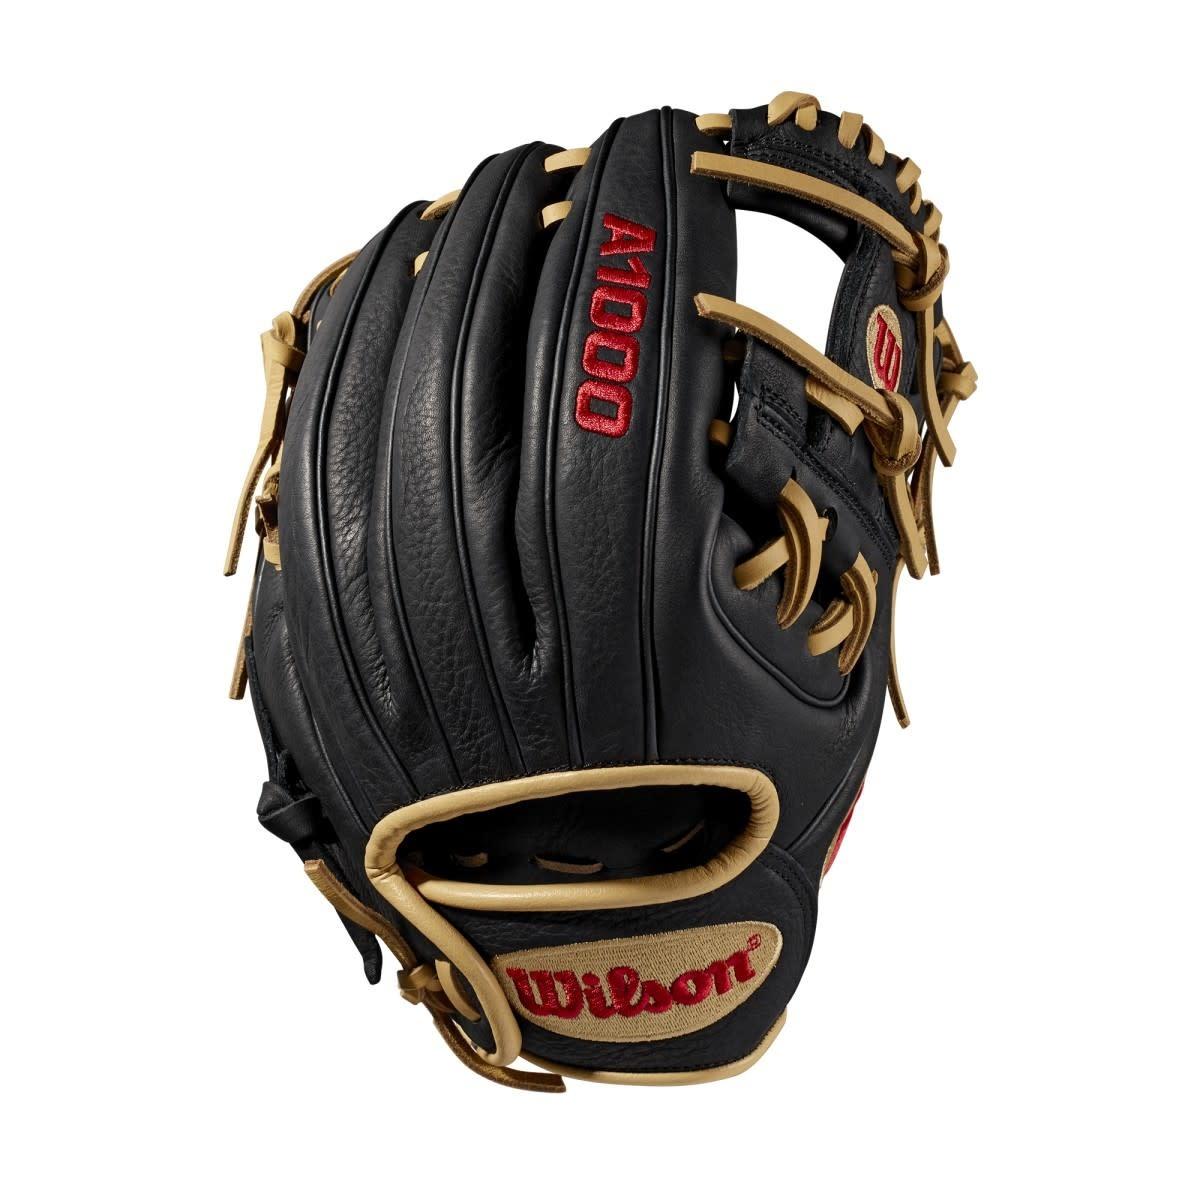 "Wilson 2019 A1000 PF88 11.25"" BASEBALL"